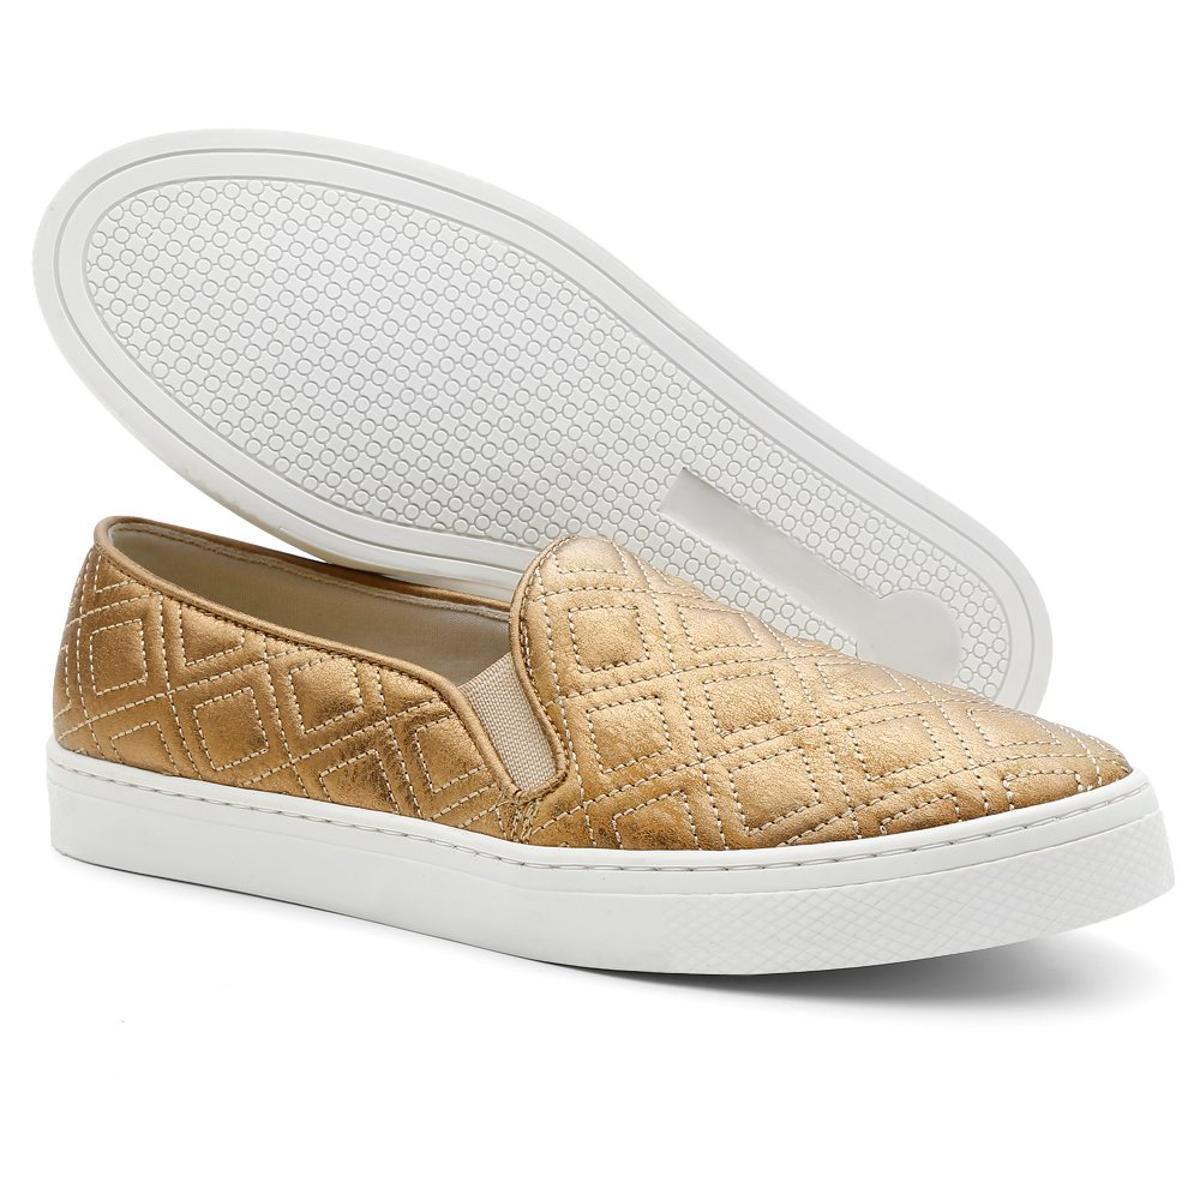 Tenis Hiate Top Franca Shoes  Feminino - Dourado